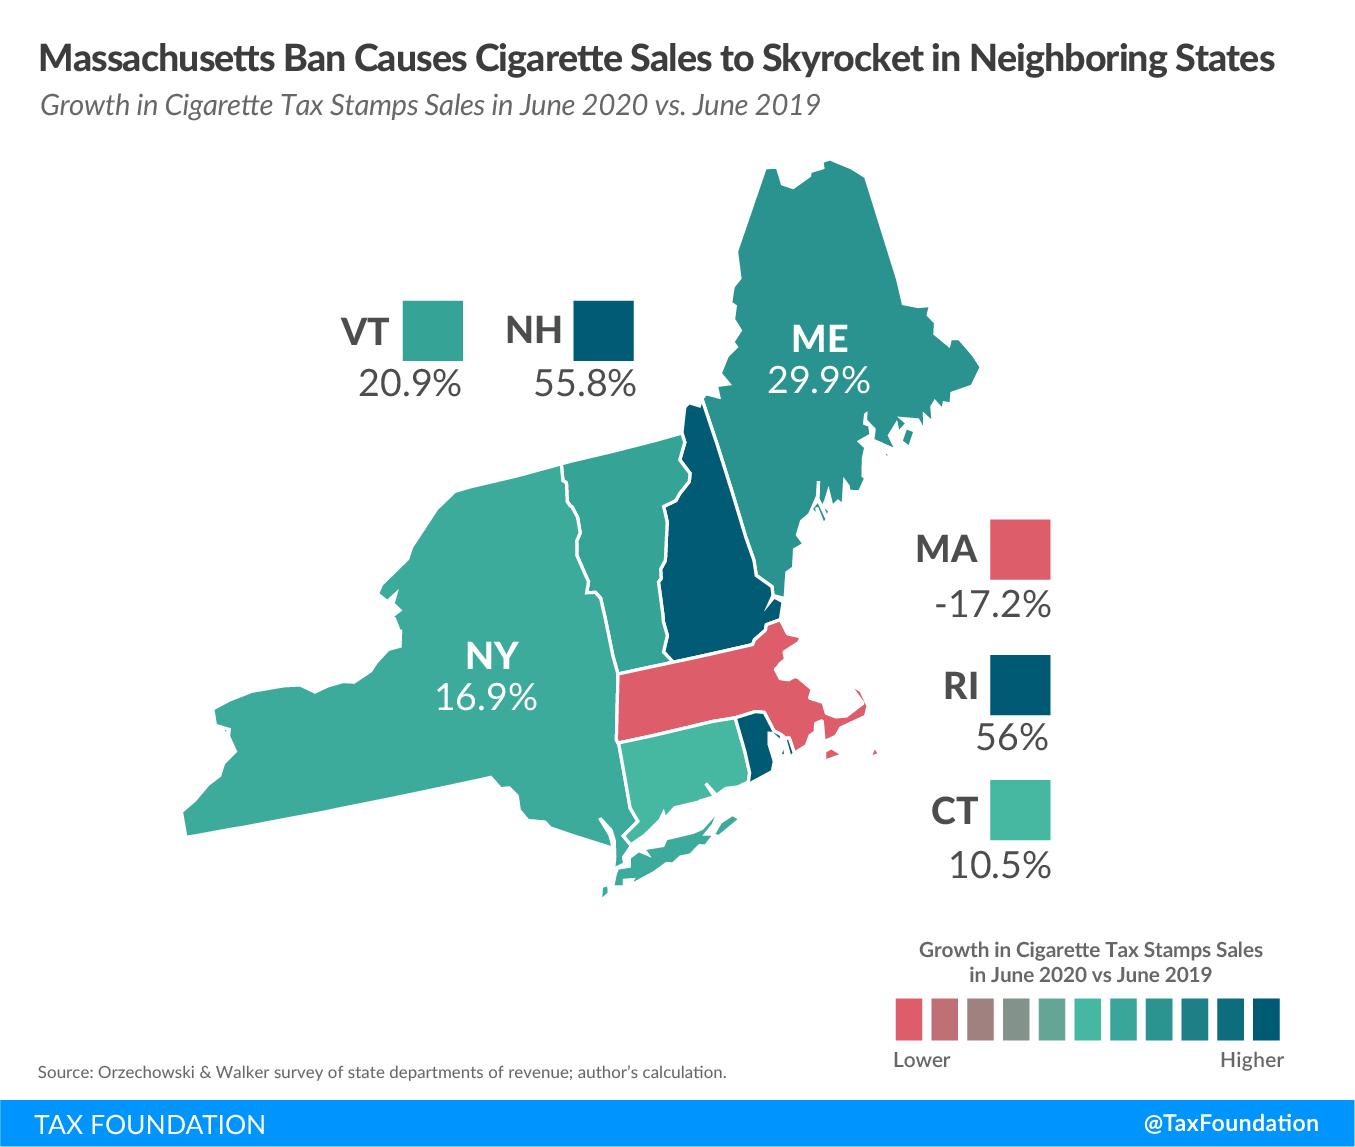 Massachusetts ban on flavored cigarettes, Massachusetts ban on flavored tobacco